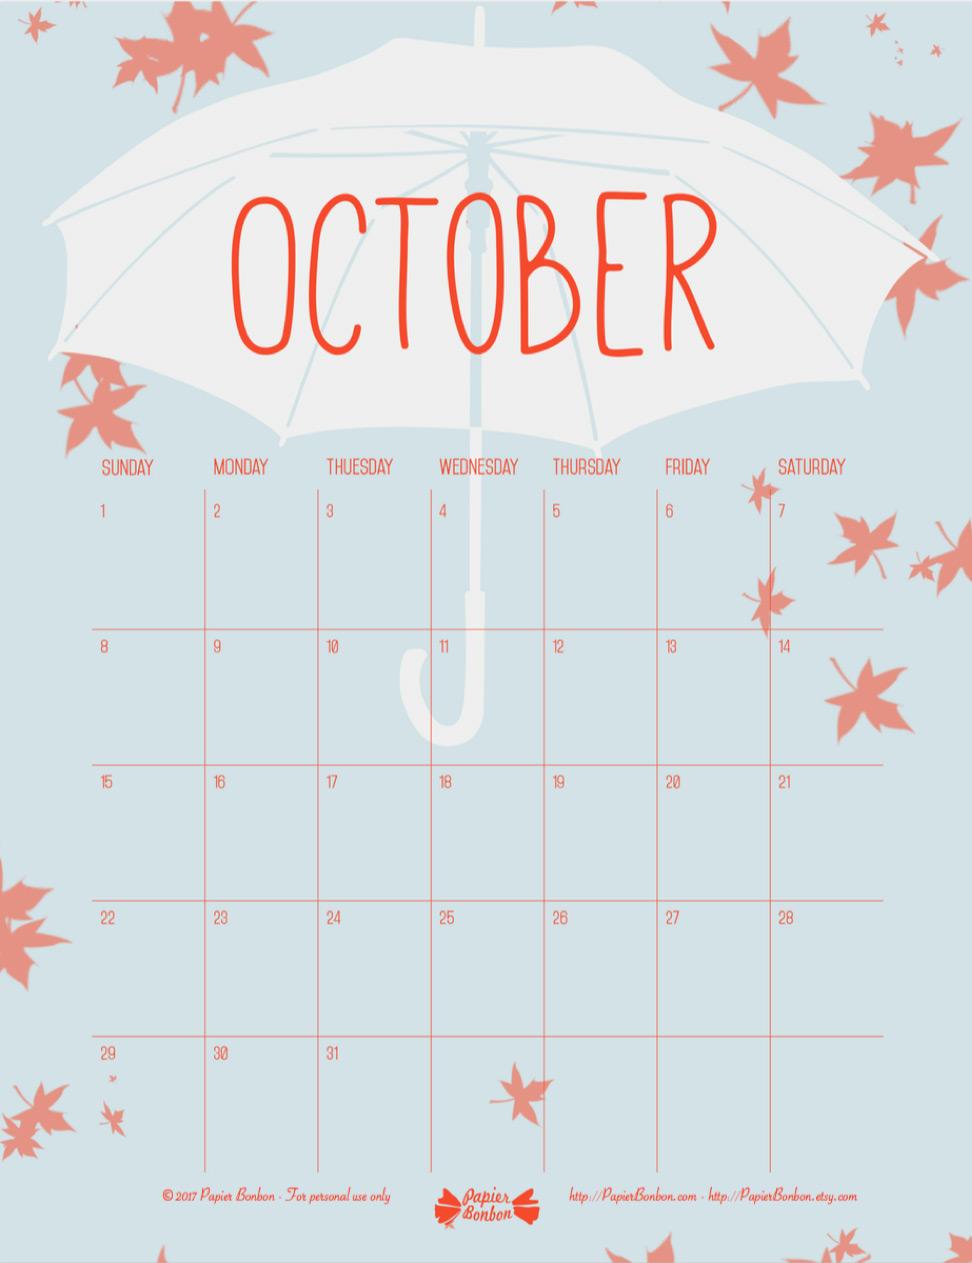 Advent Calendar Live Wallpaper : October printable calendar papier bonbon